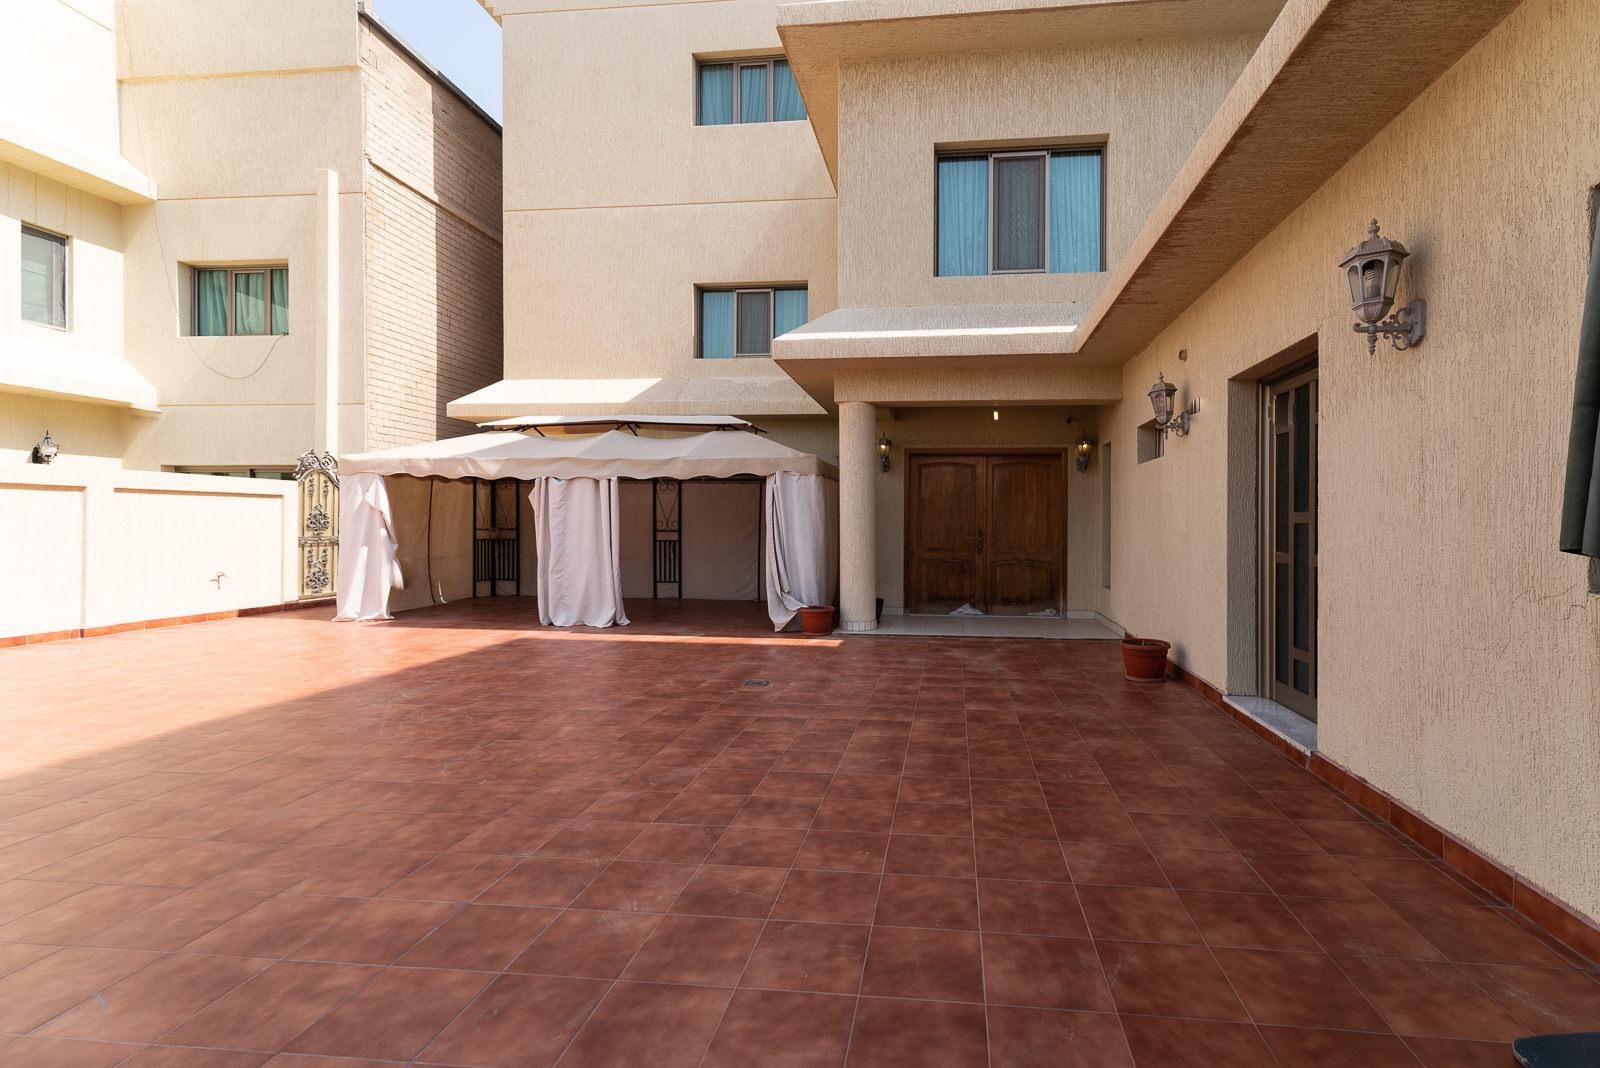 Sabah Al Salem – very large two bedroom ground floor w/ private yard